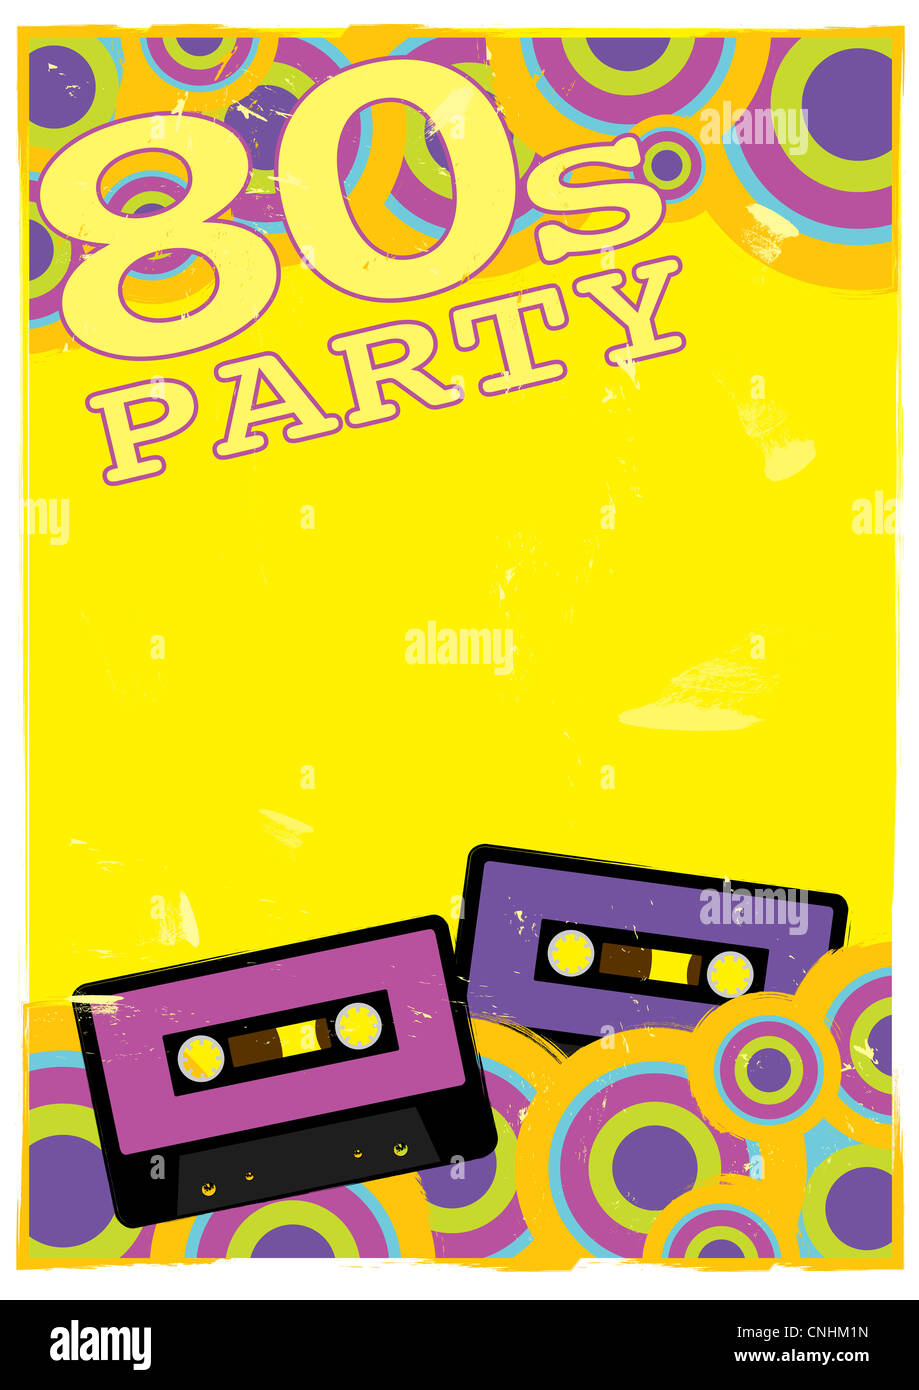 Retro Poster - 80s parte Flyer con cintas de cassette de audio Imagen De Stock